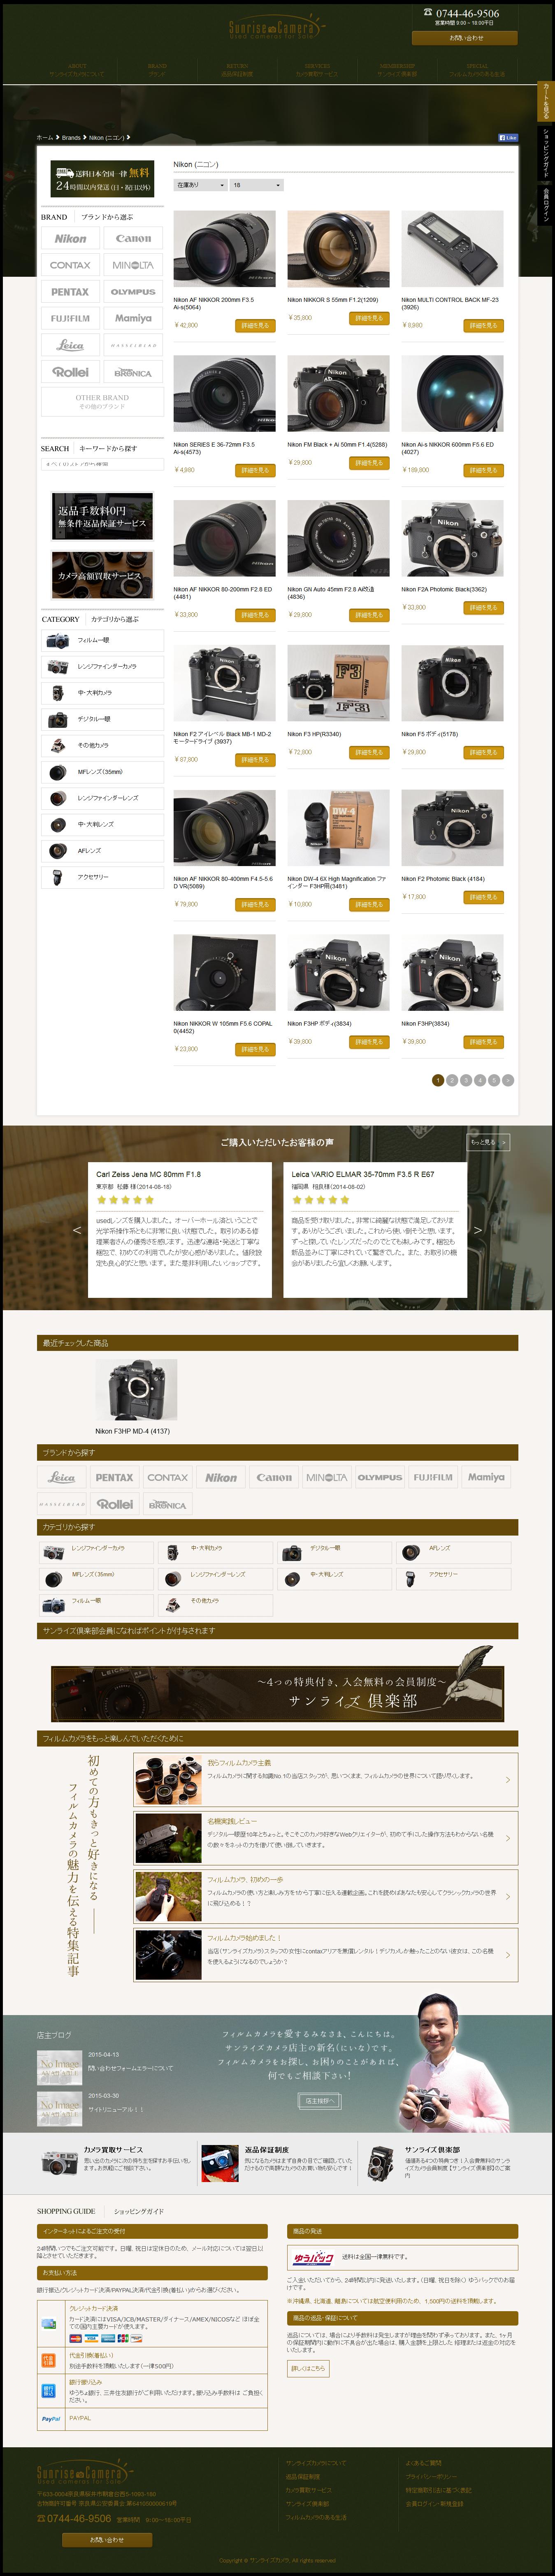 Nikon (ニコン) – サンライズカメラ 2015-08-01 01-50-48